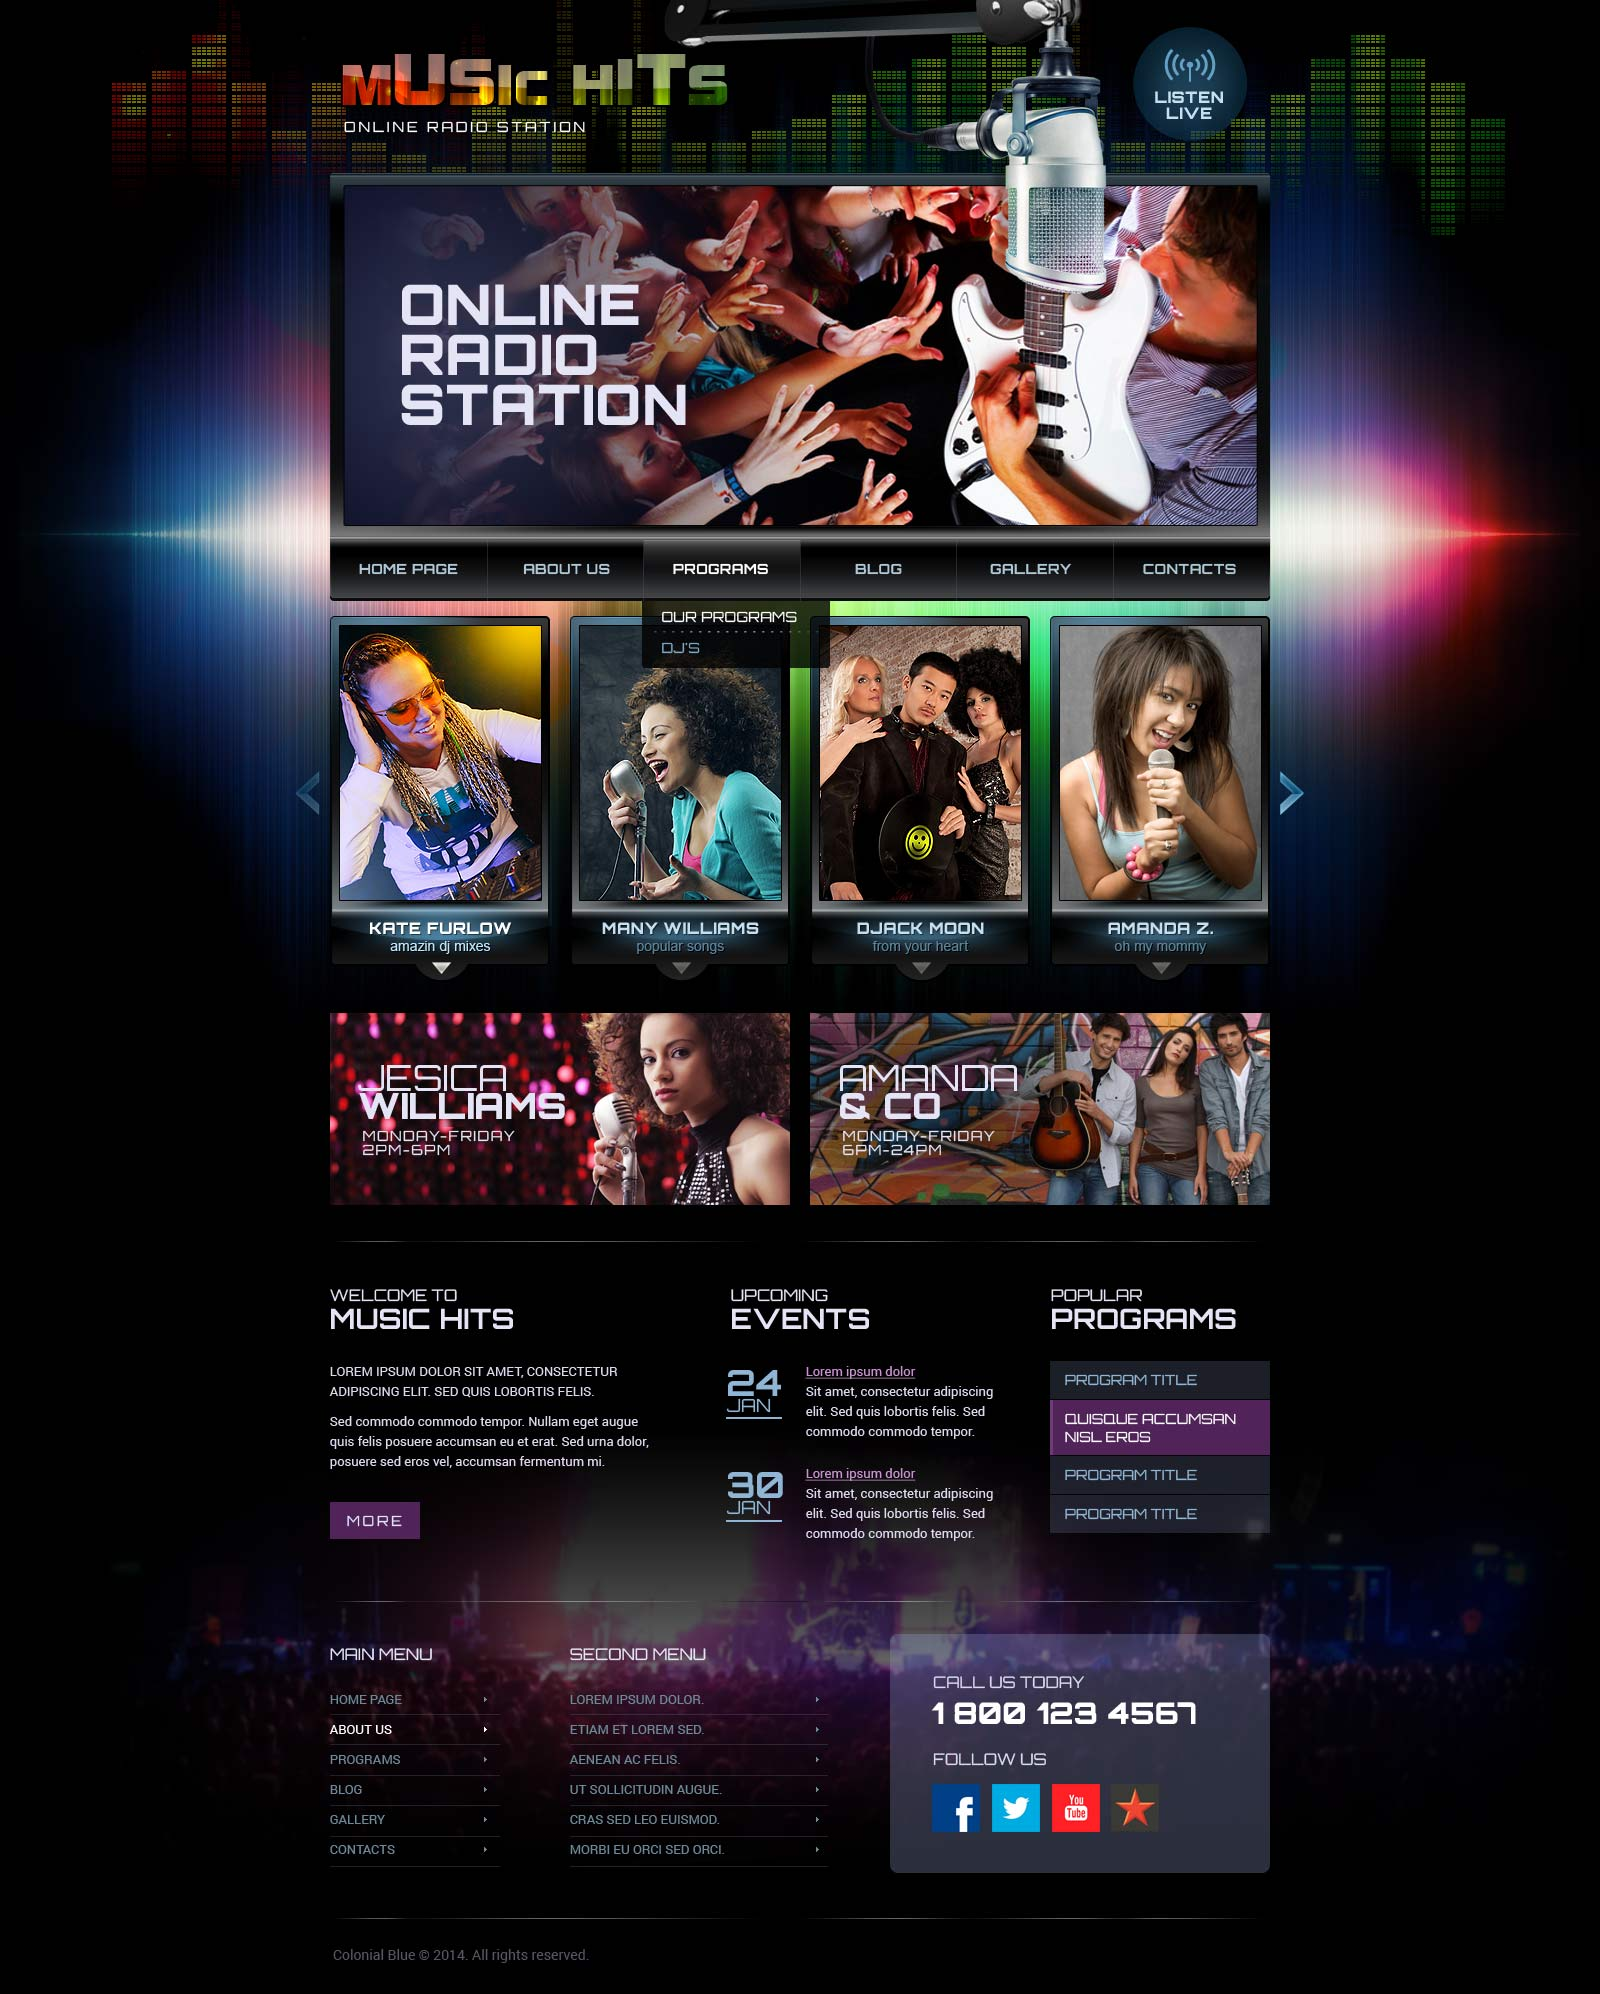 Online Radio Station - Wordpress template ID: 300111825 from ...